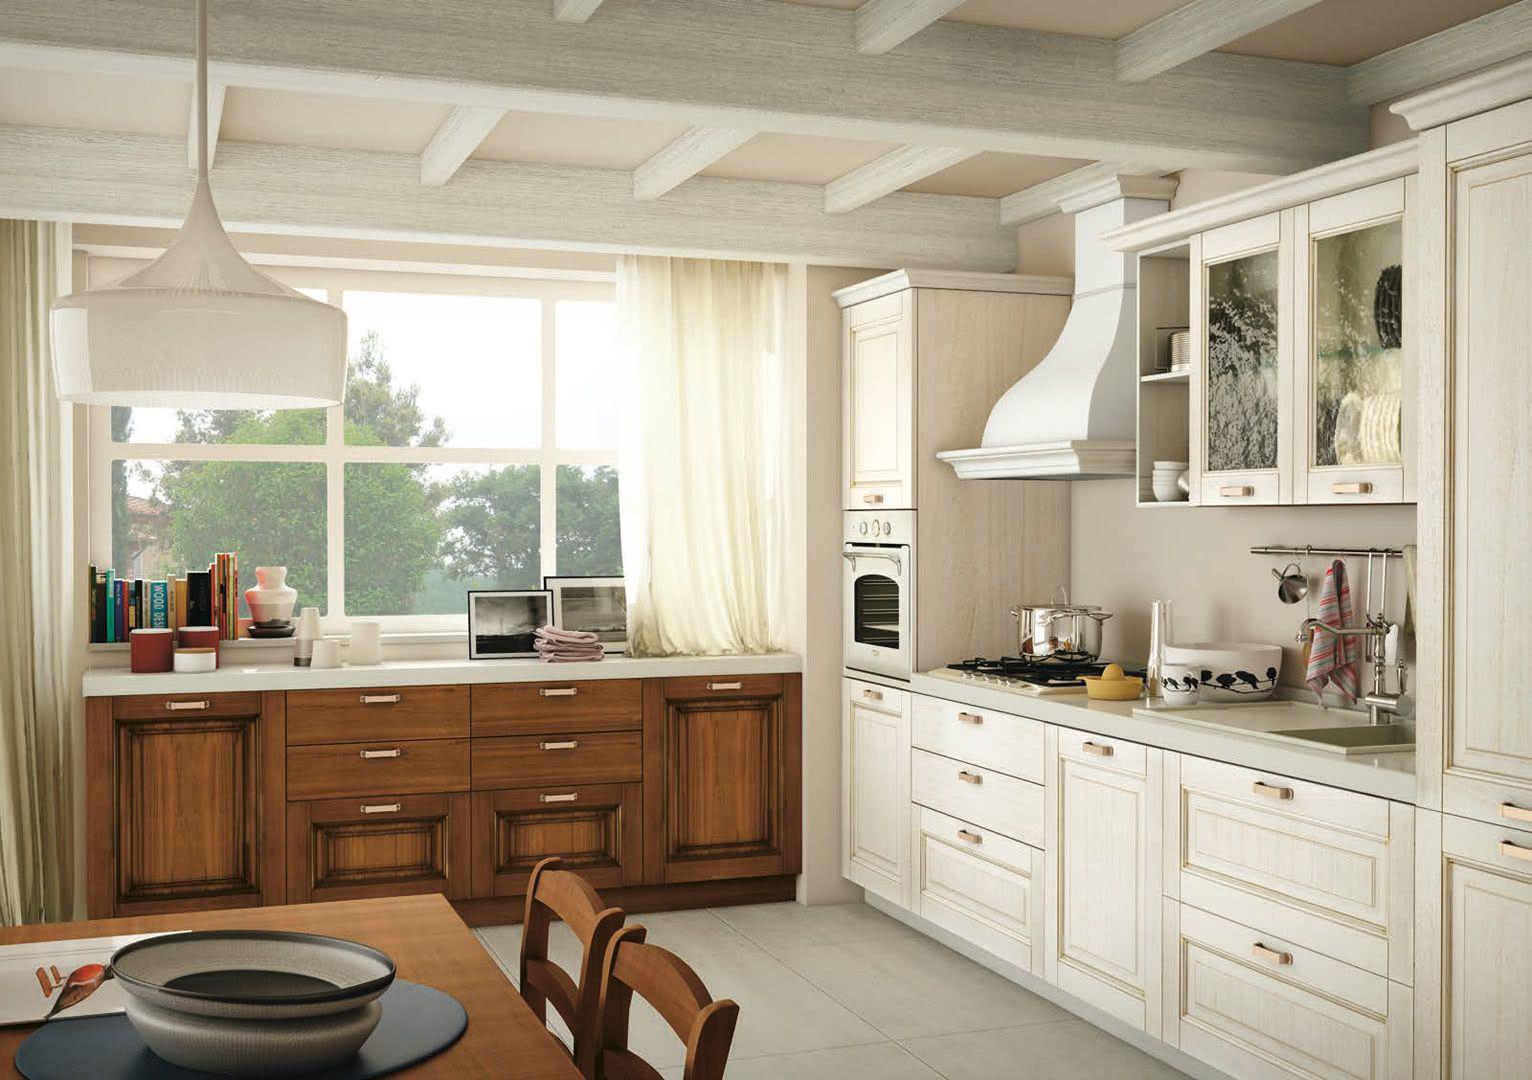 Oprah Classical Kitchens Creo Kitchens Interer Kuhni Interer Kuhnya